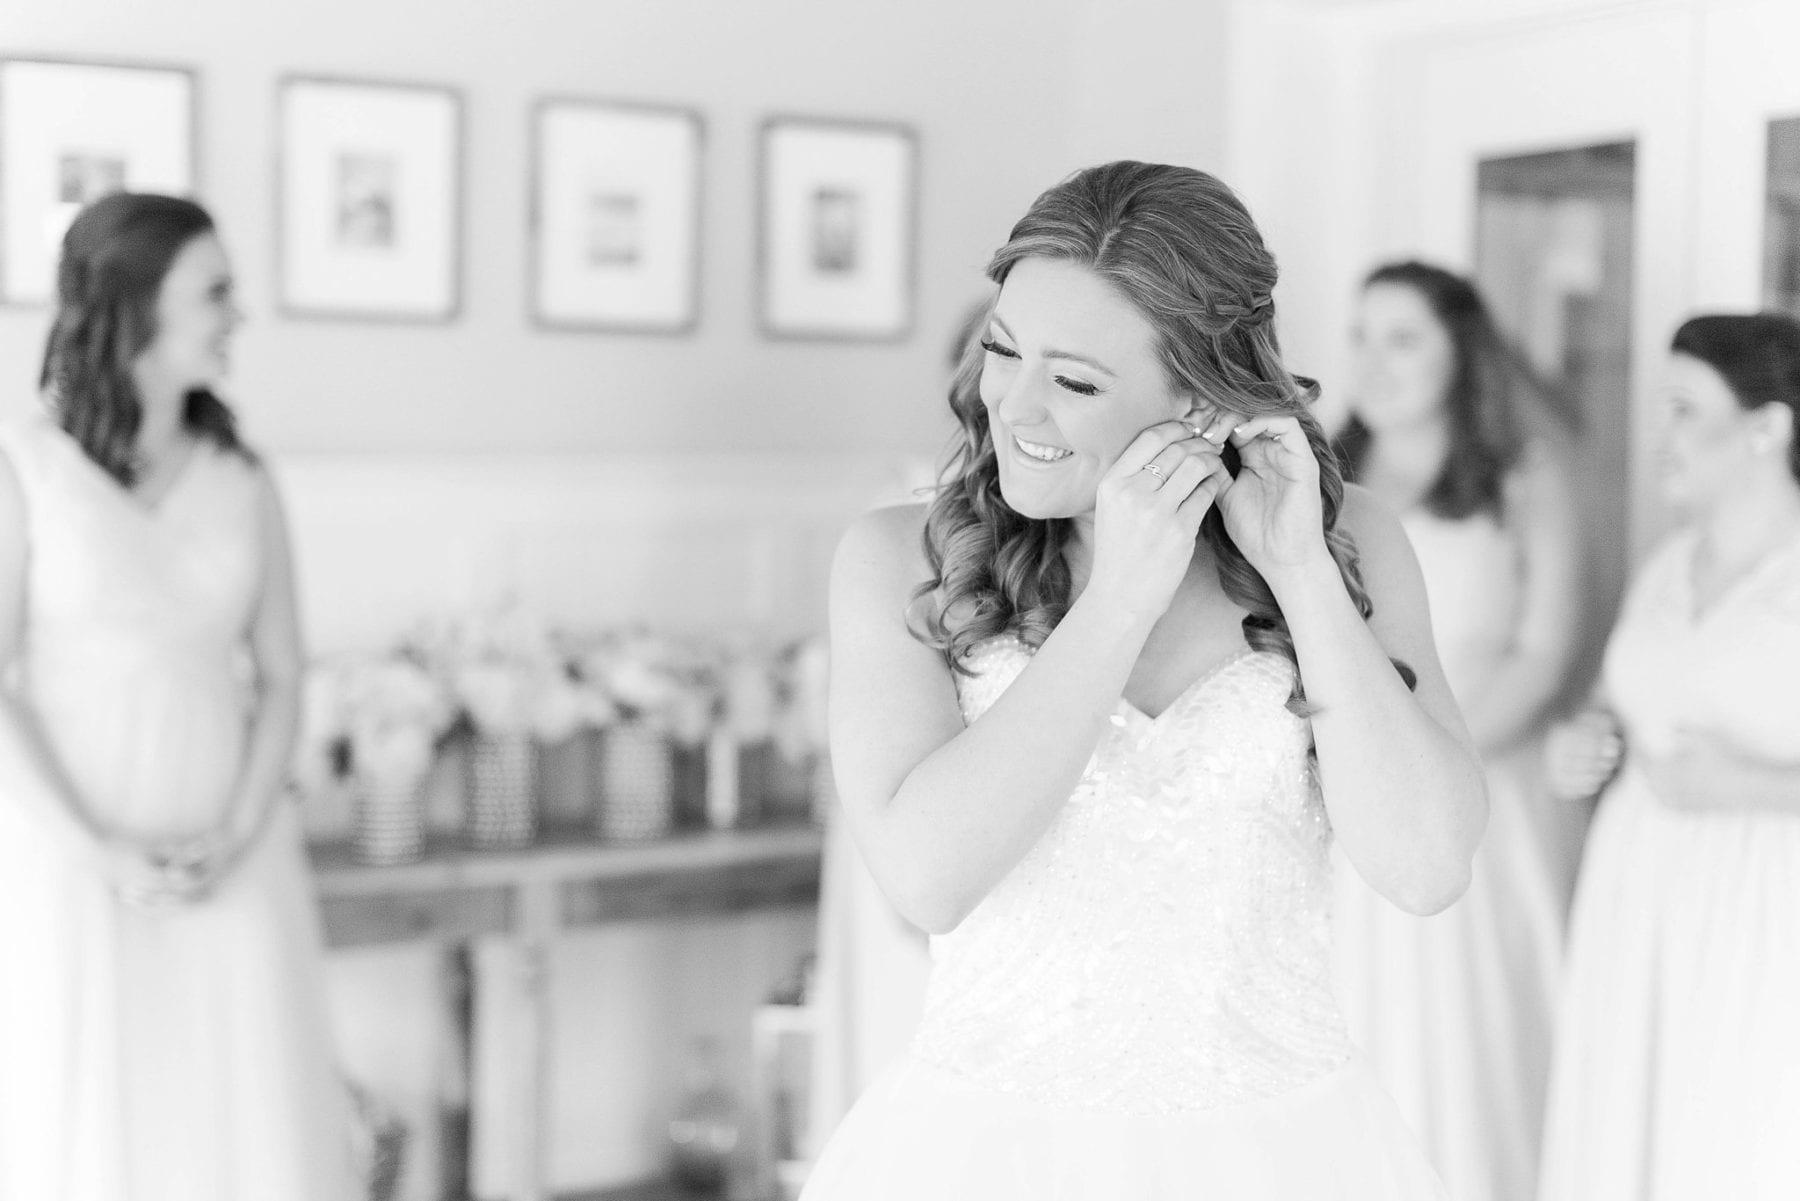 Justin & Megan Big Spring Farm Wedding Photos-36.jpg